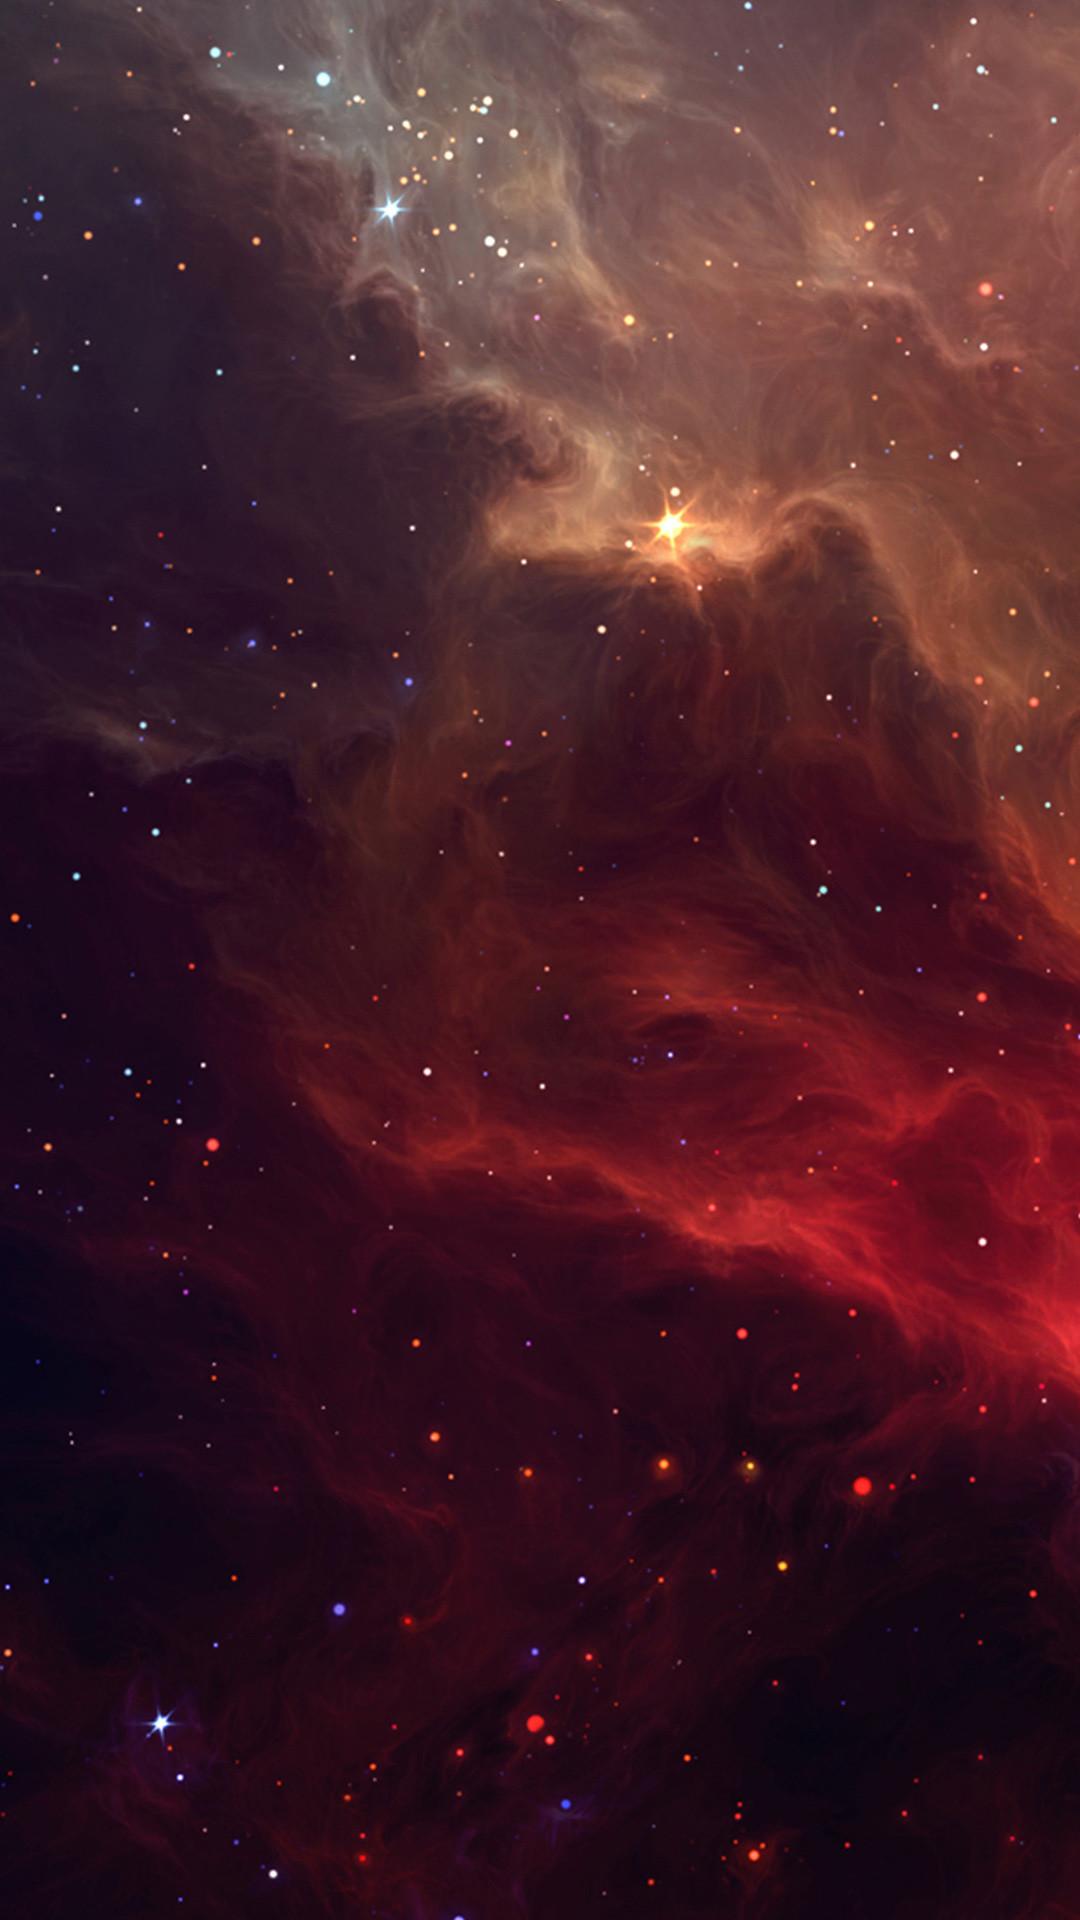 Red Galactic Nebula Htc One M8 wallpaper